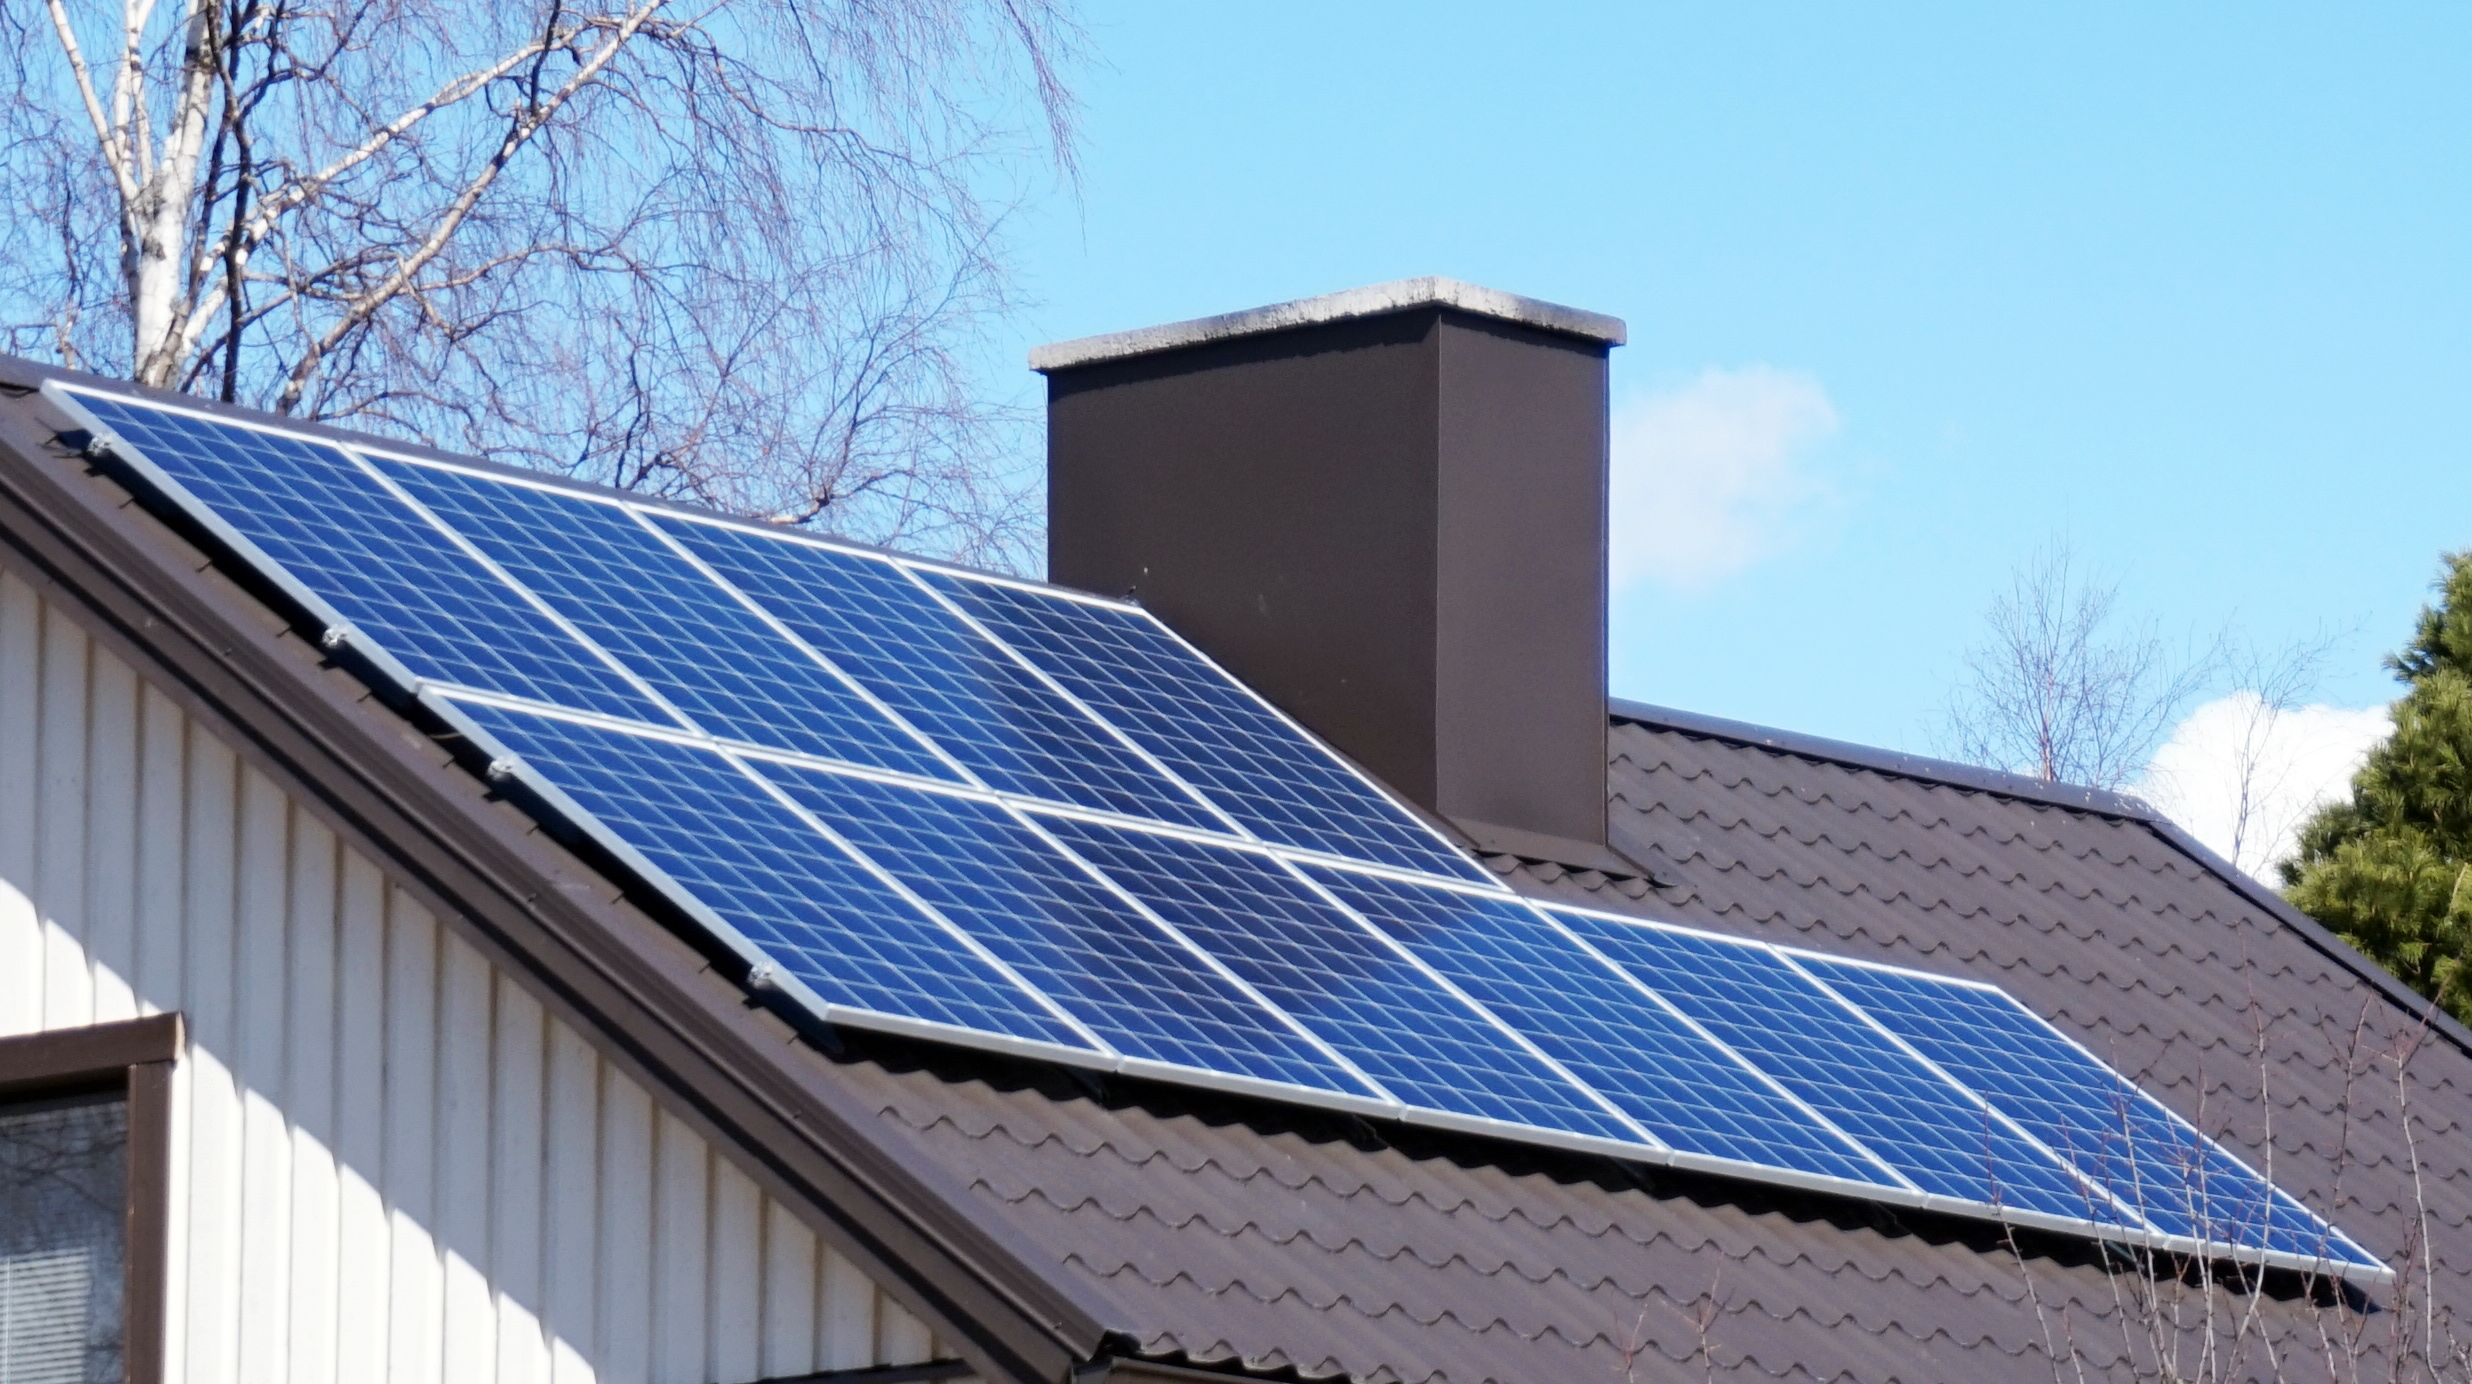 Green Energy For All  Solar Energy Vector  Making the